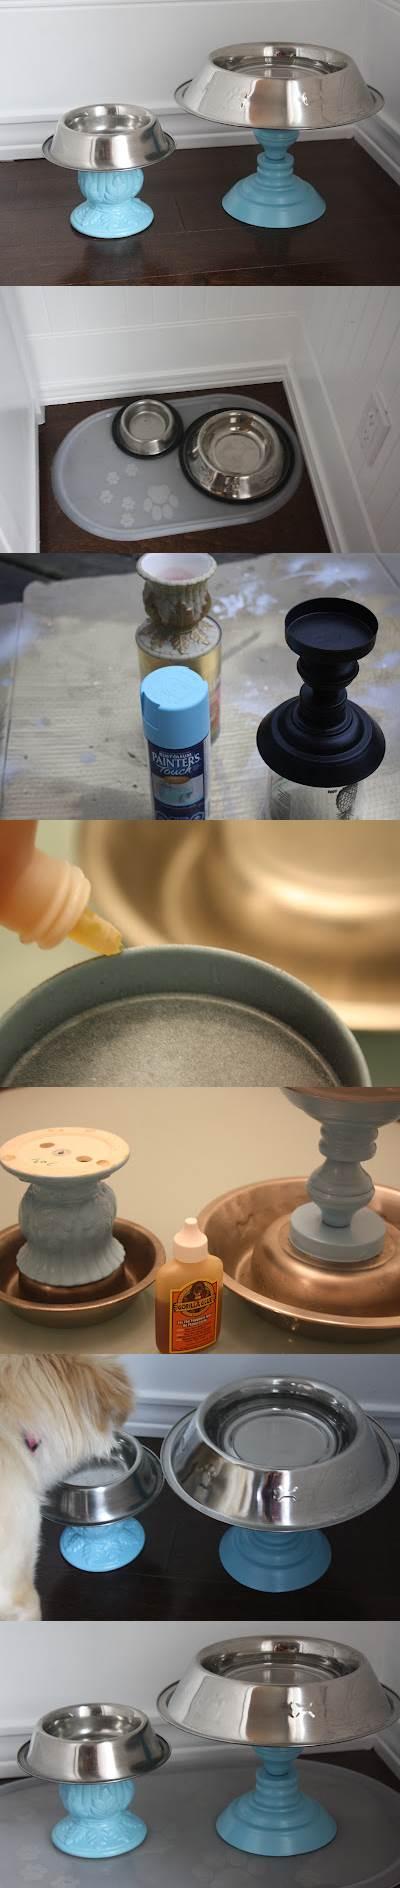 DIY Raised Pet Bowls 2